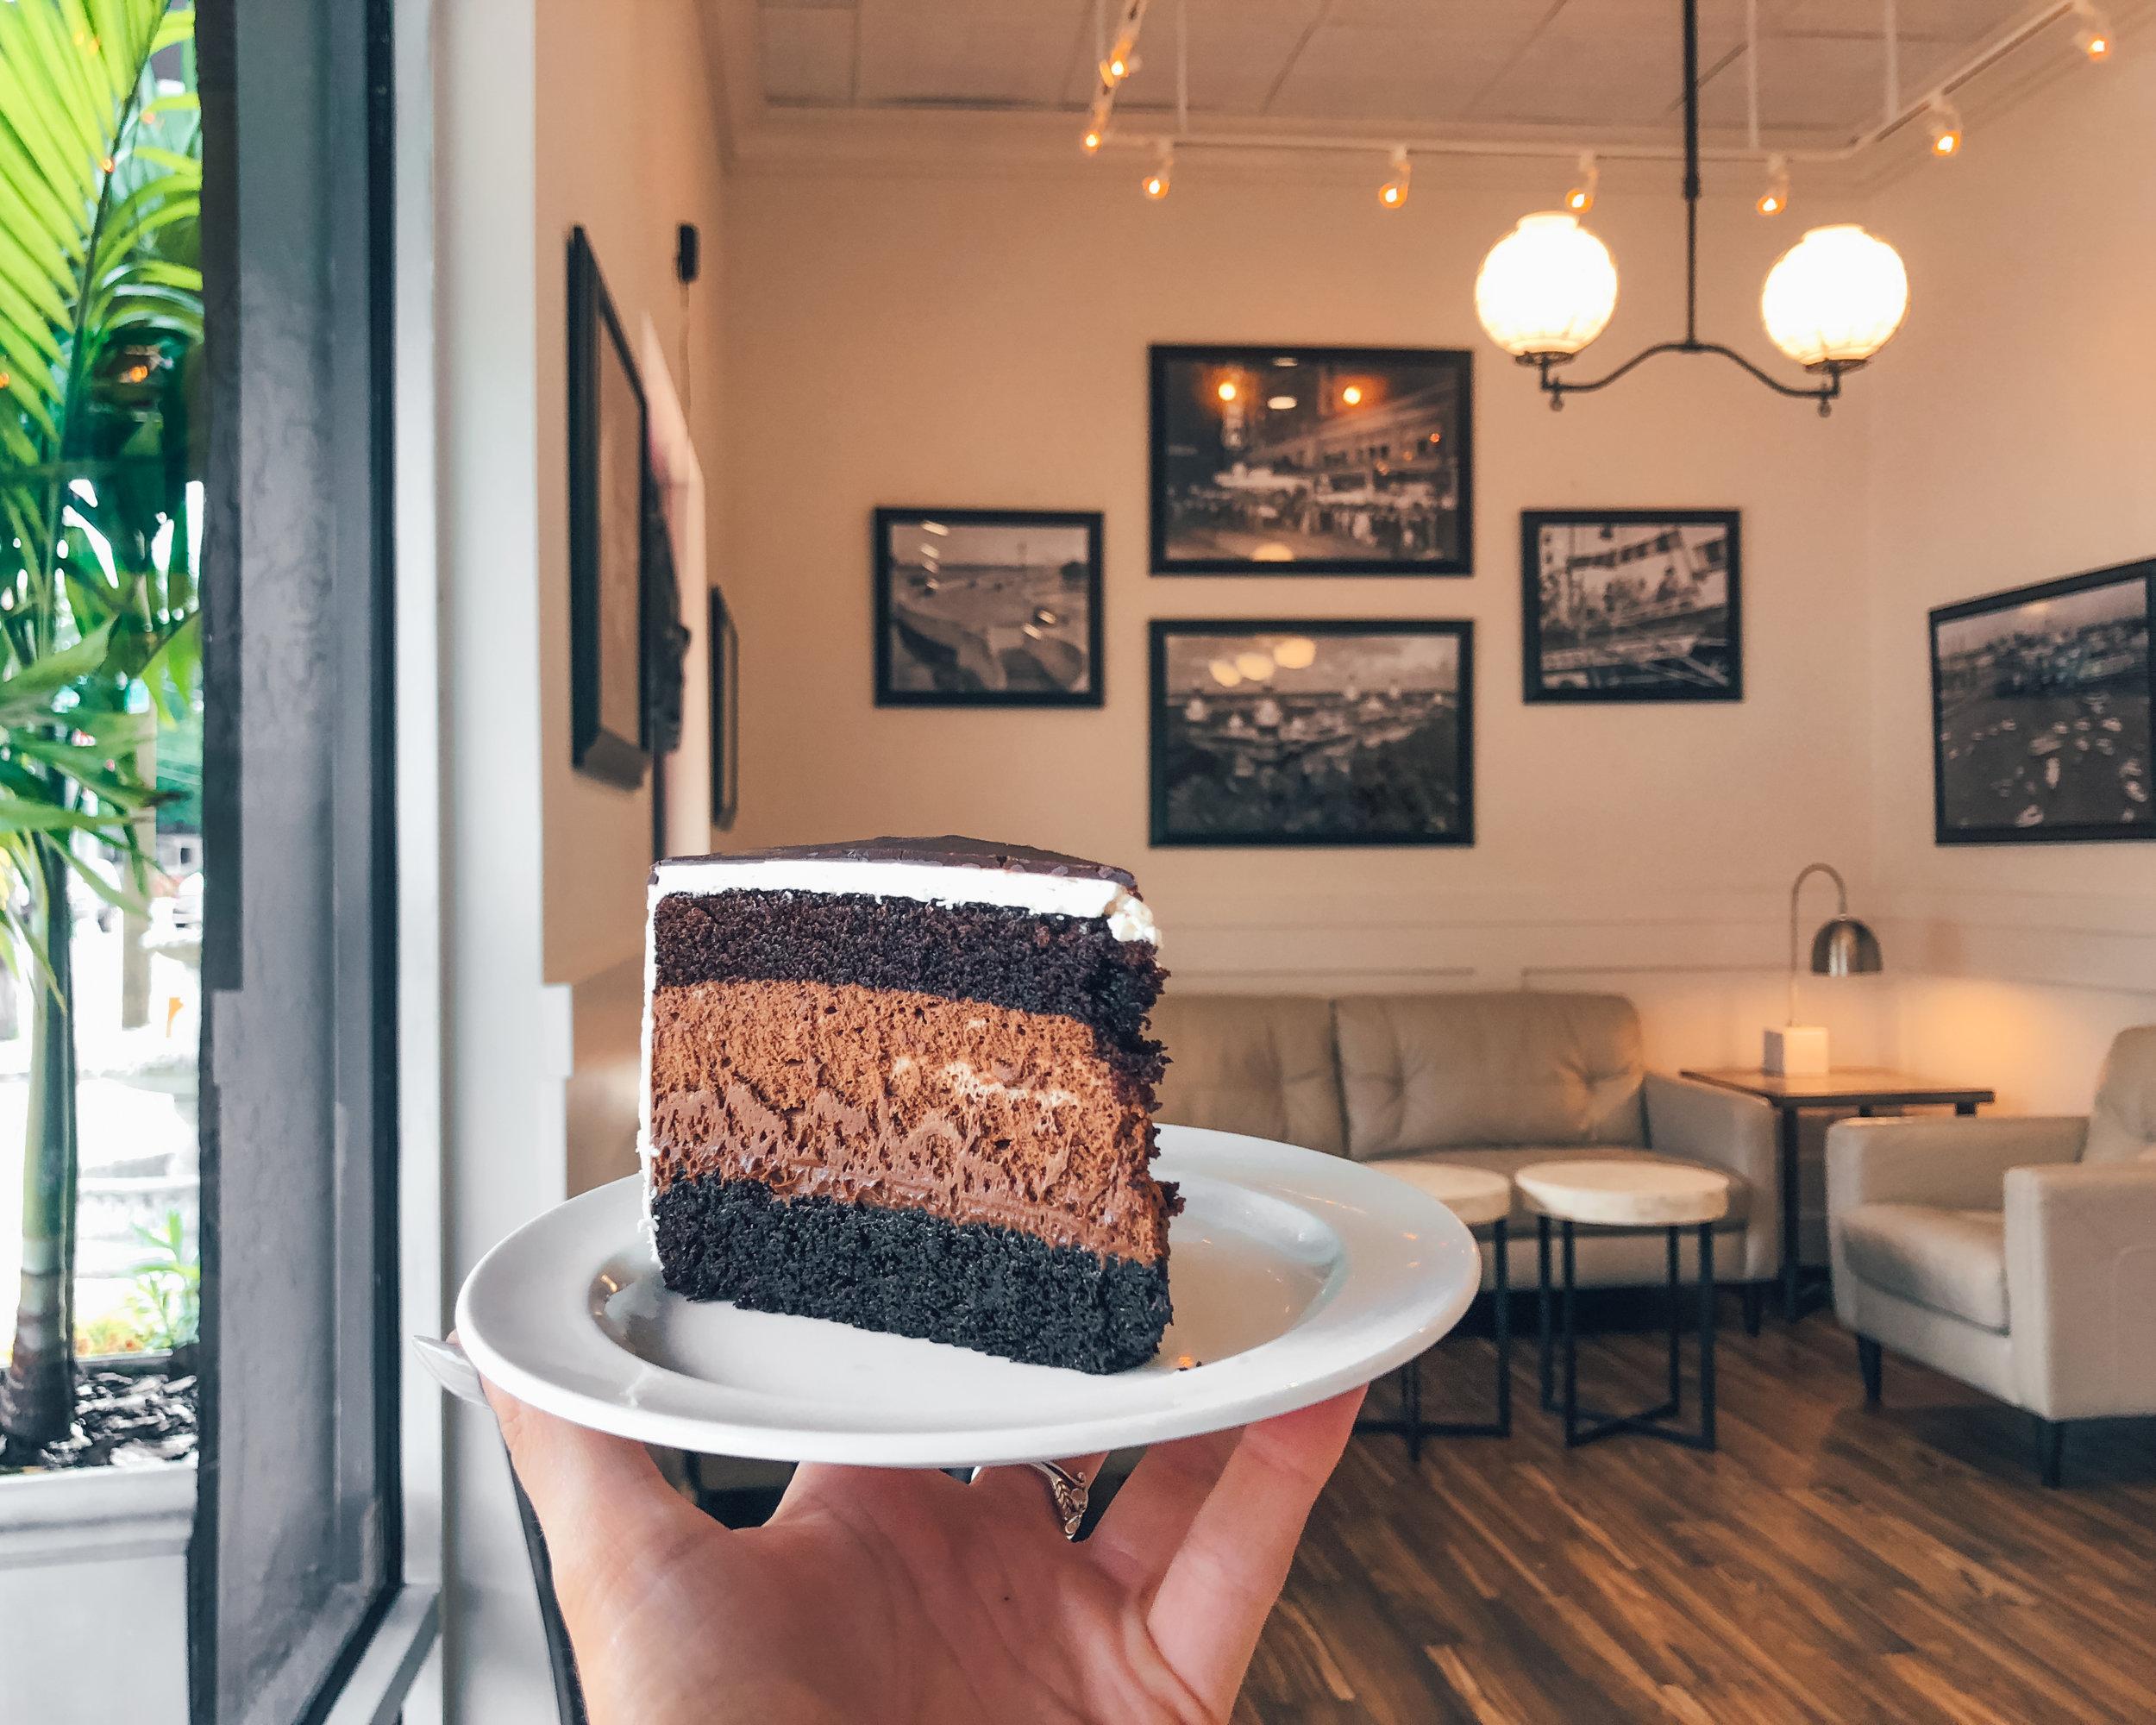 chocolate mousse dessert spot